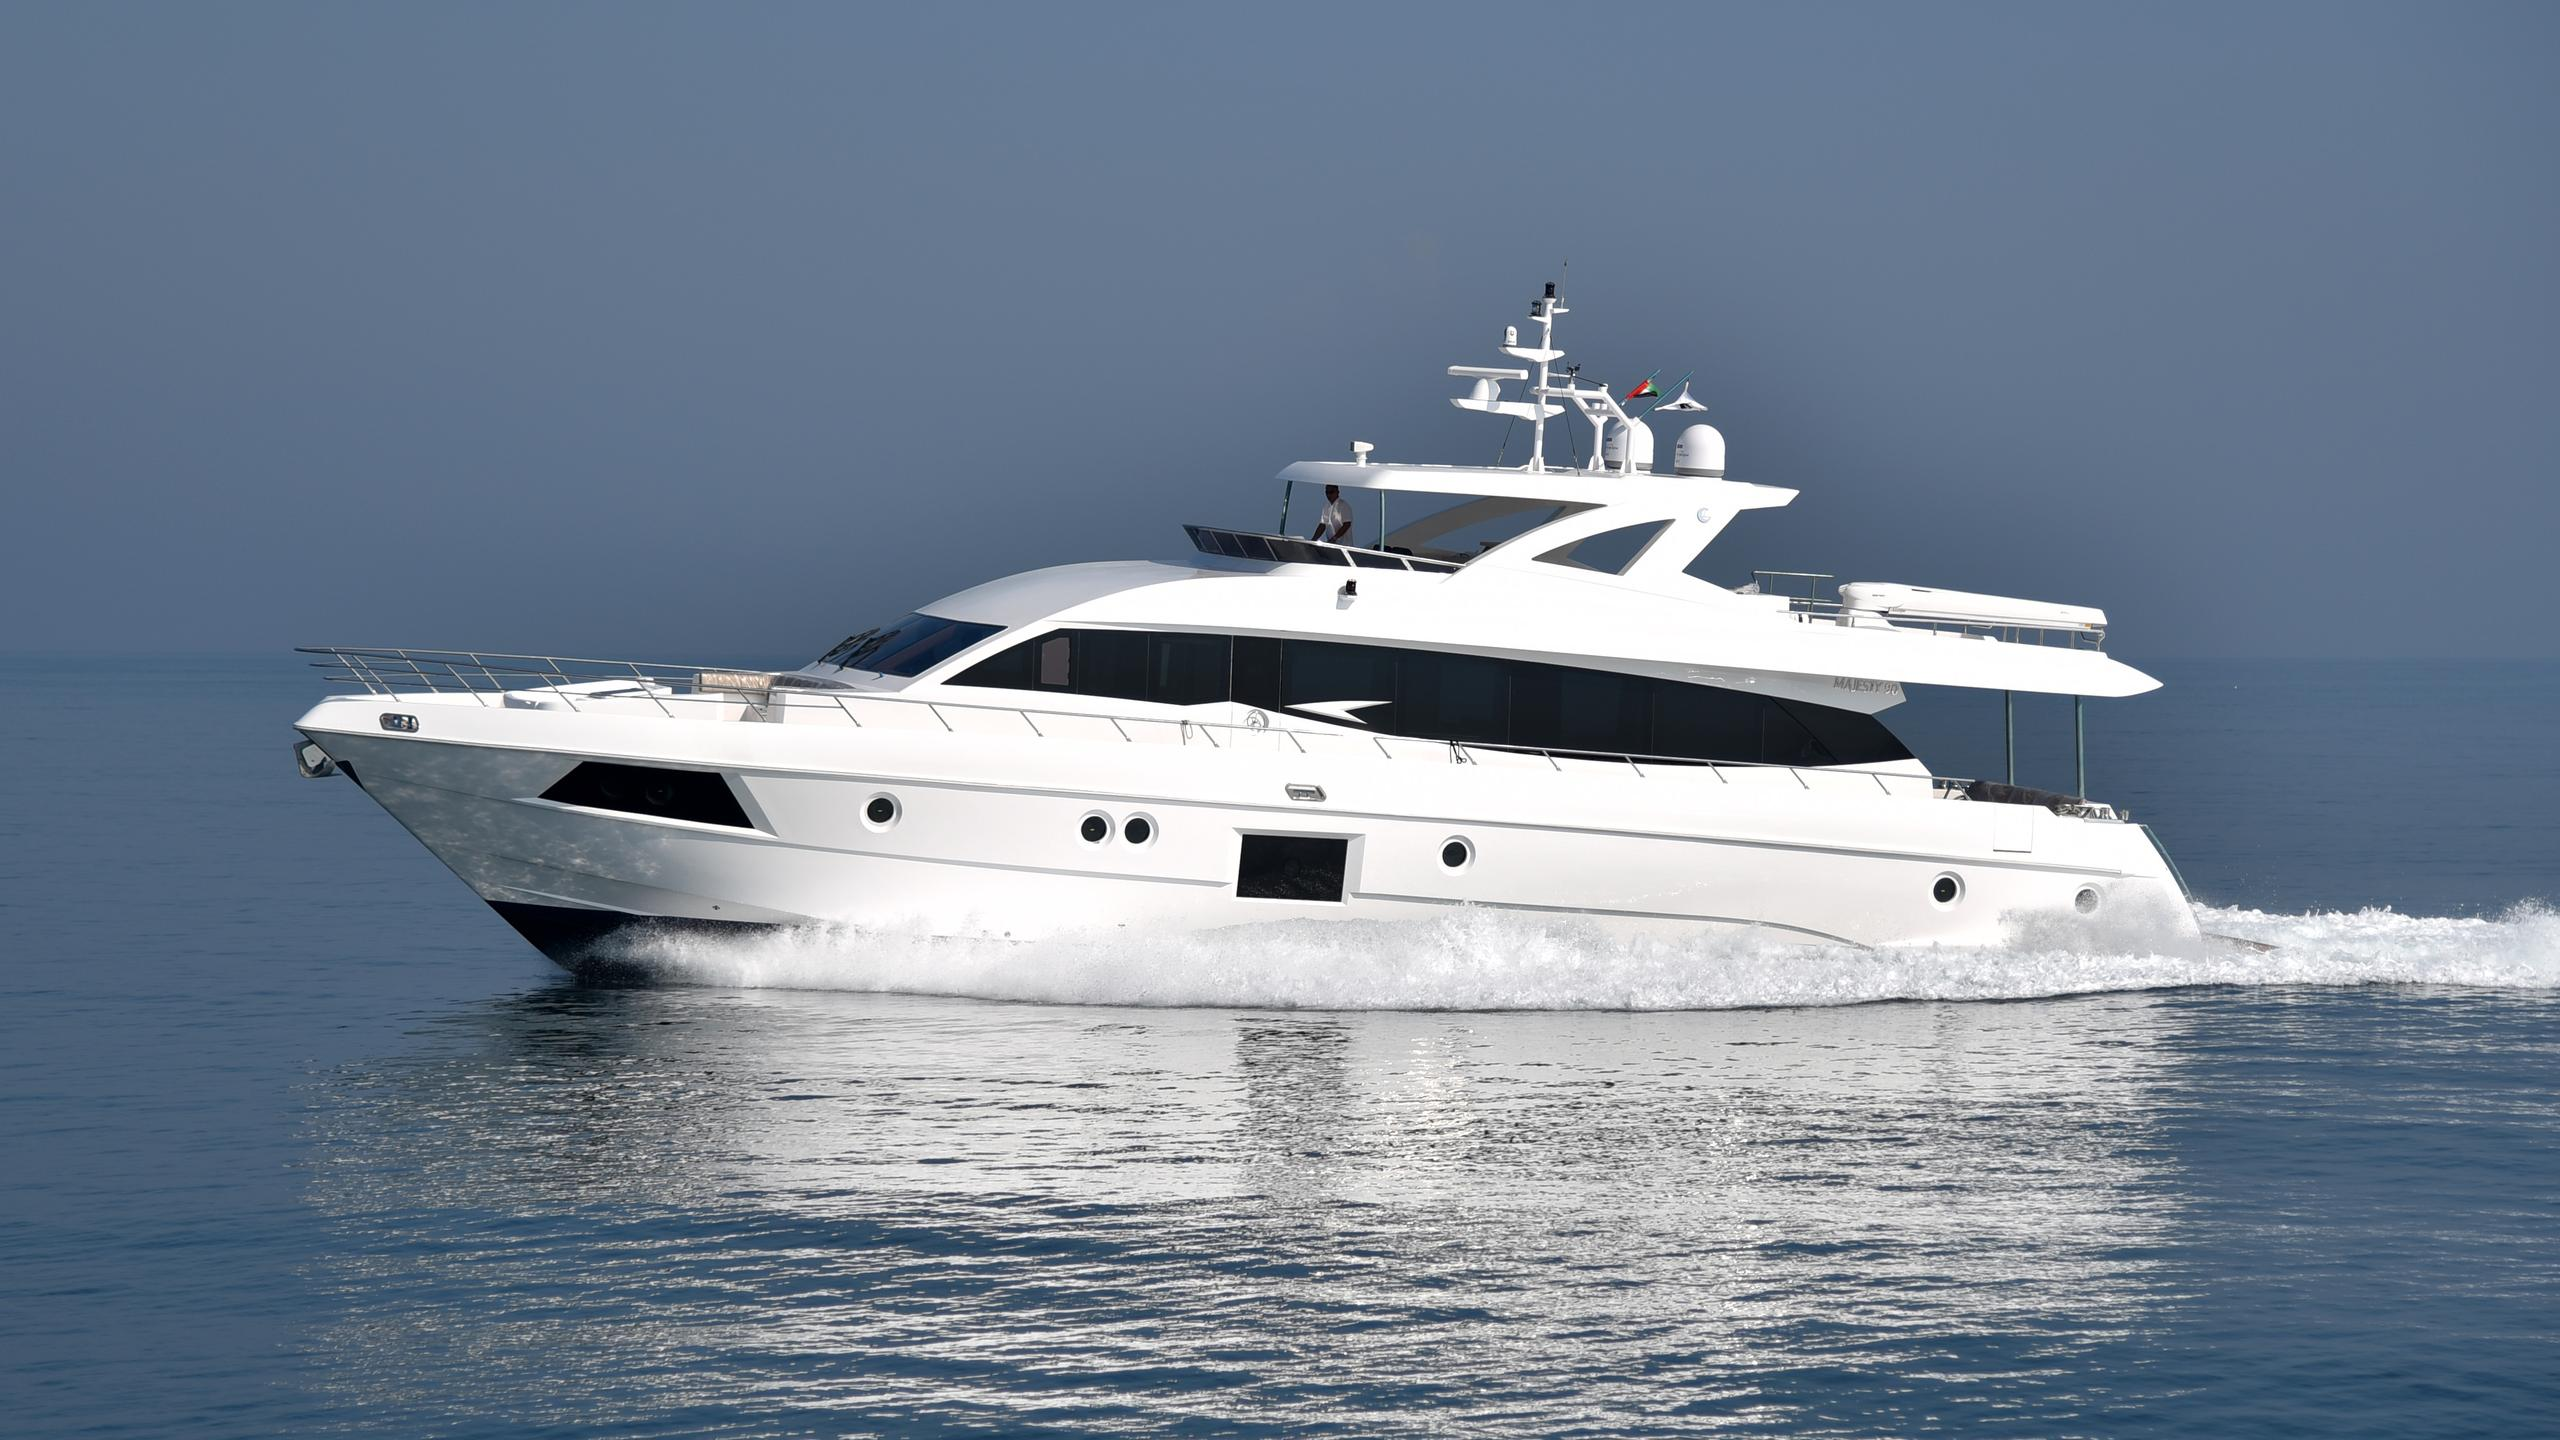 majesty-90-motoryacht-gulfcraft-majesty-90-2016-27m-running-profile